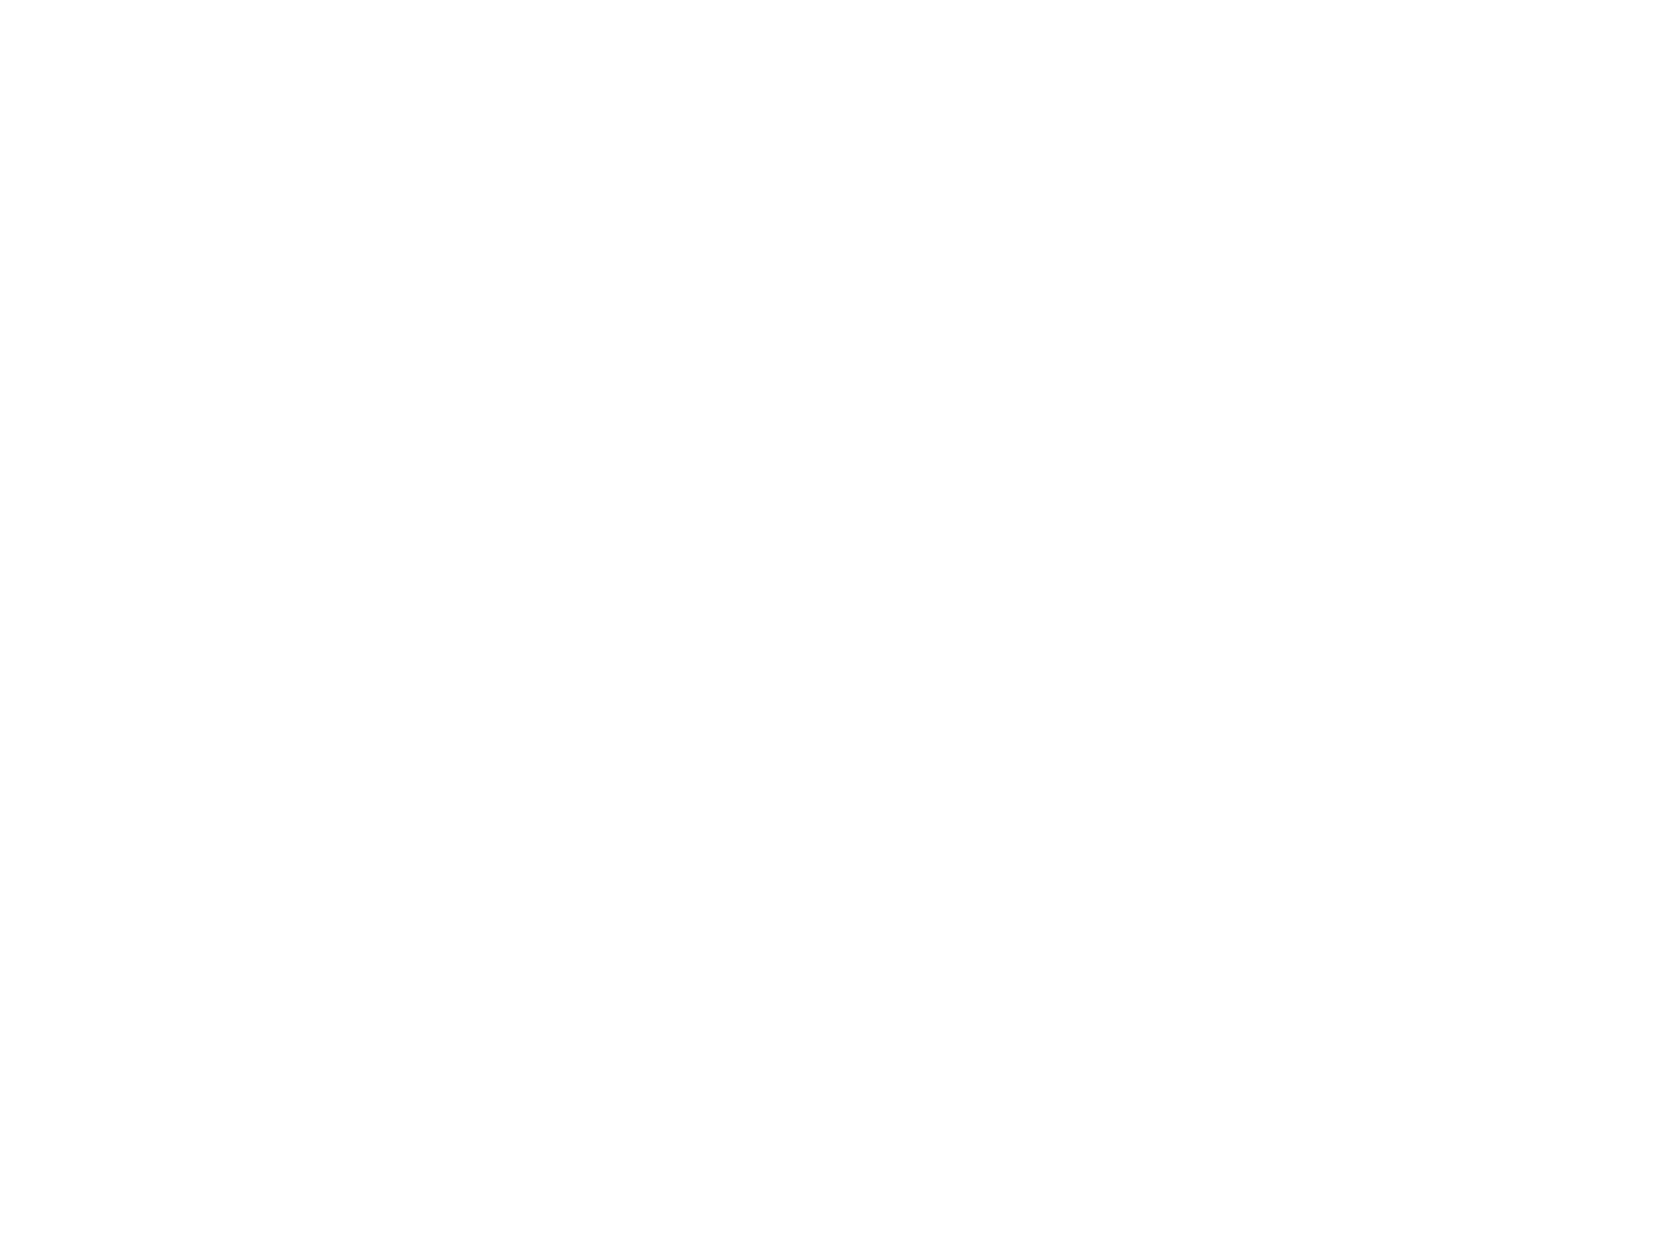 Mailaddress Meloncast